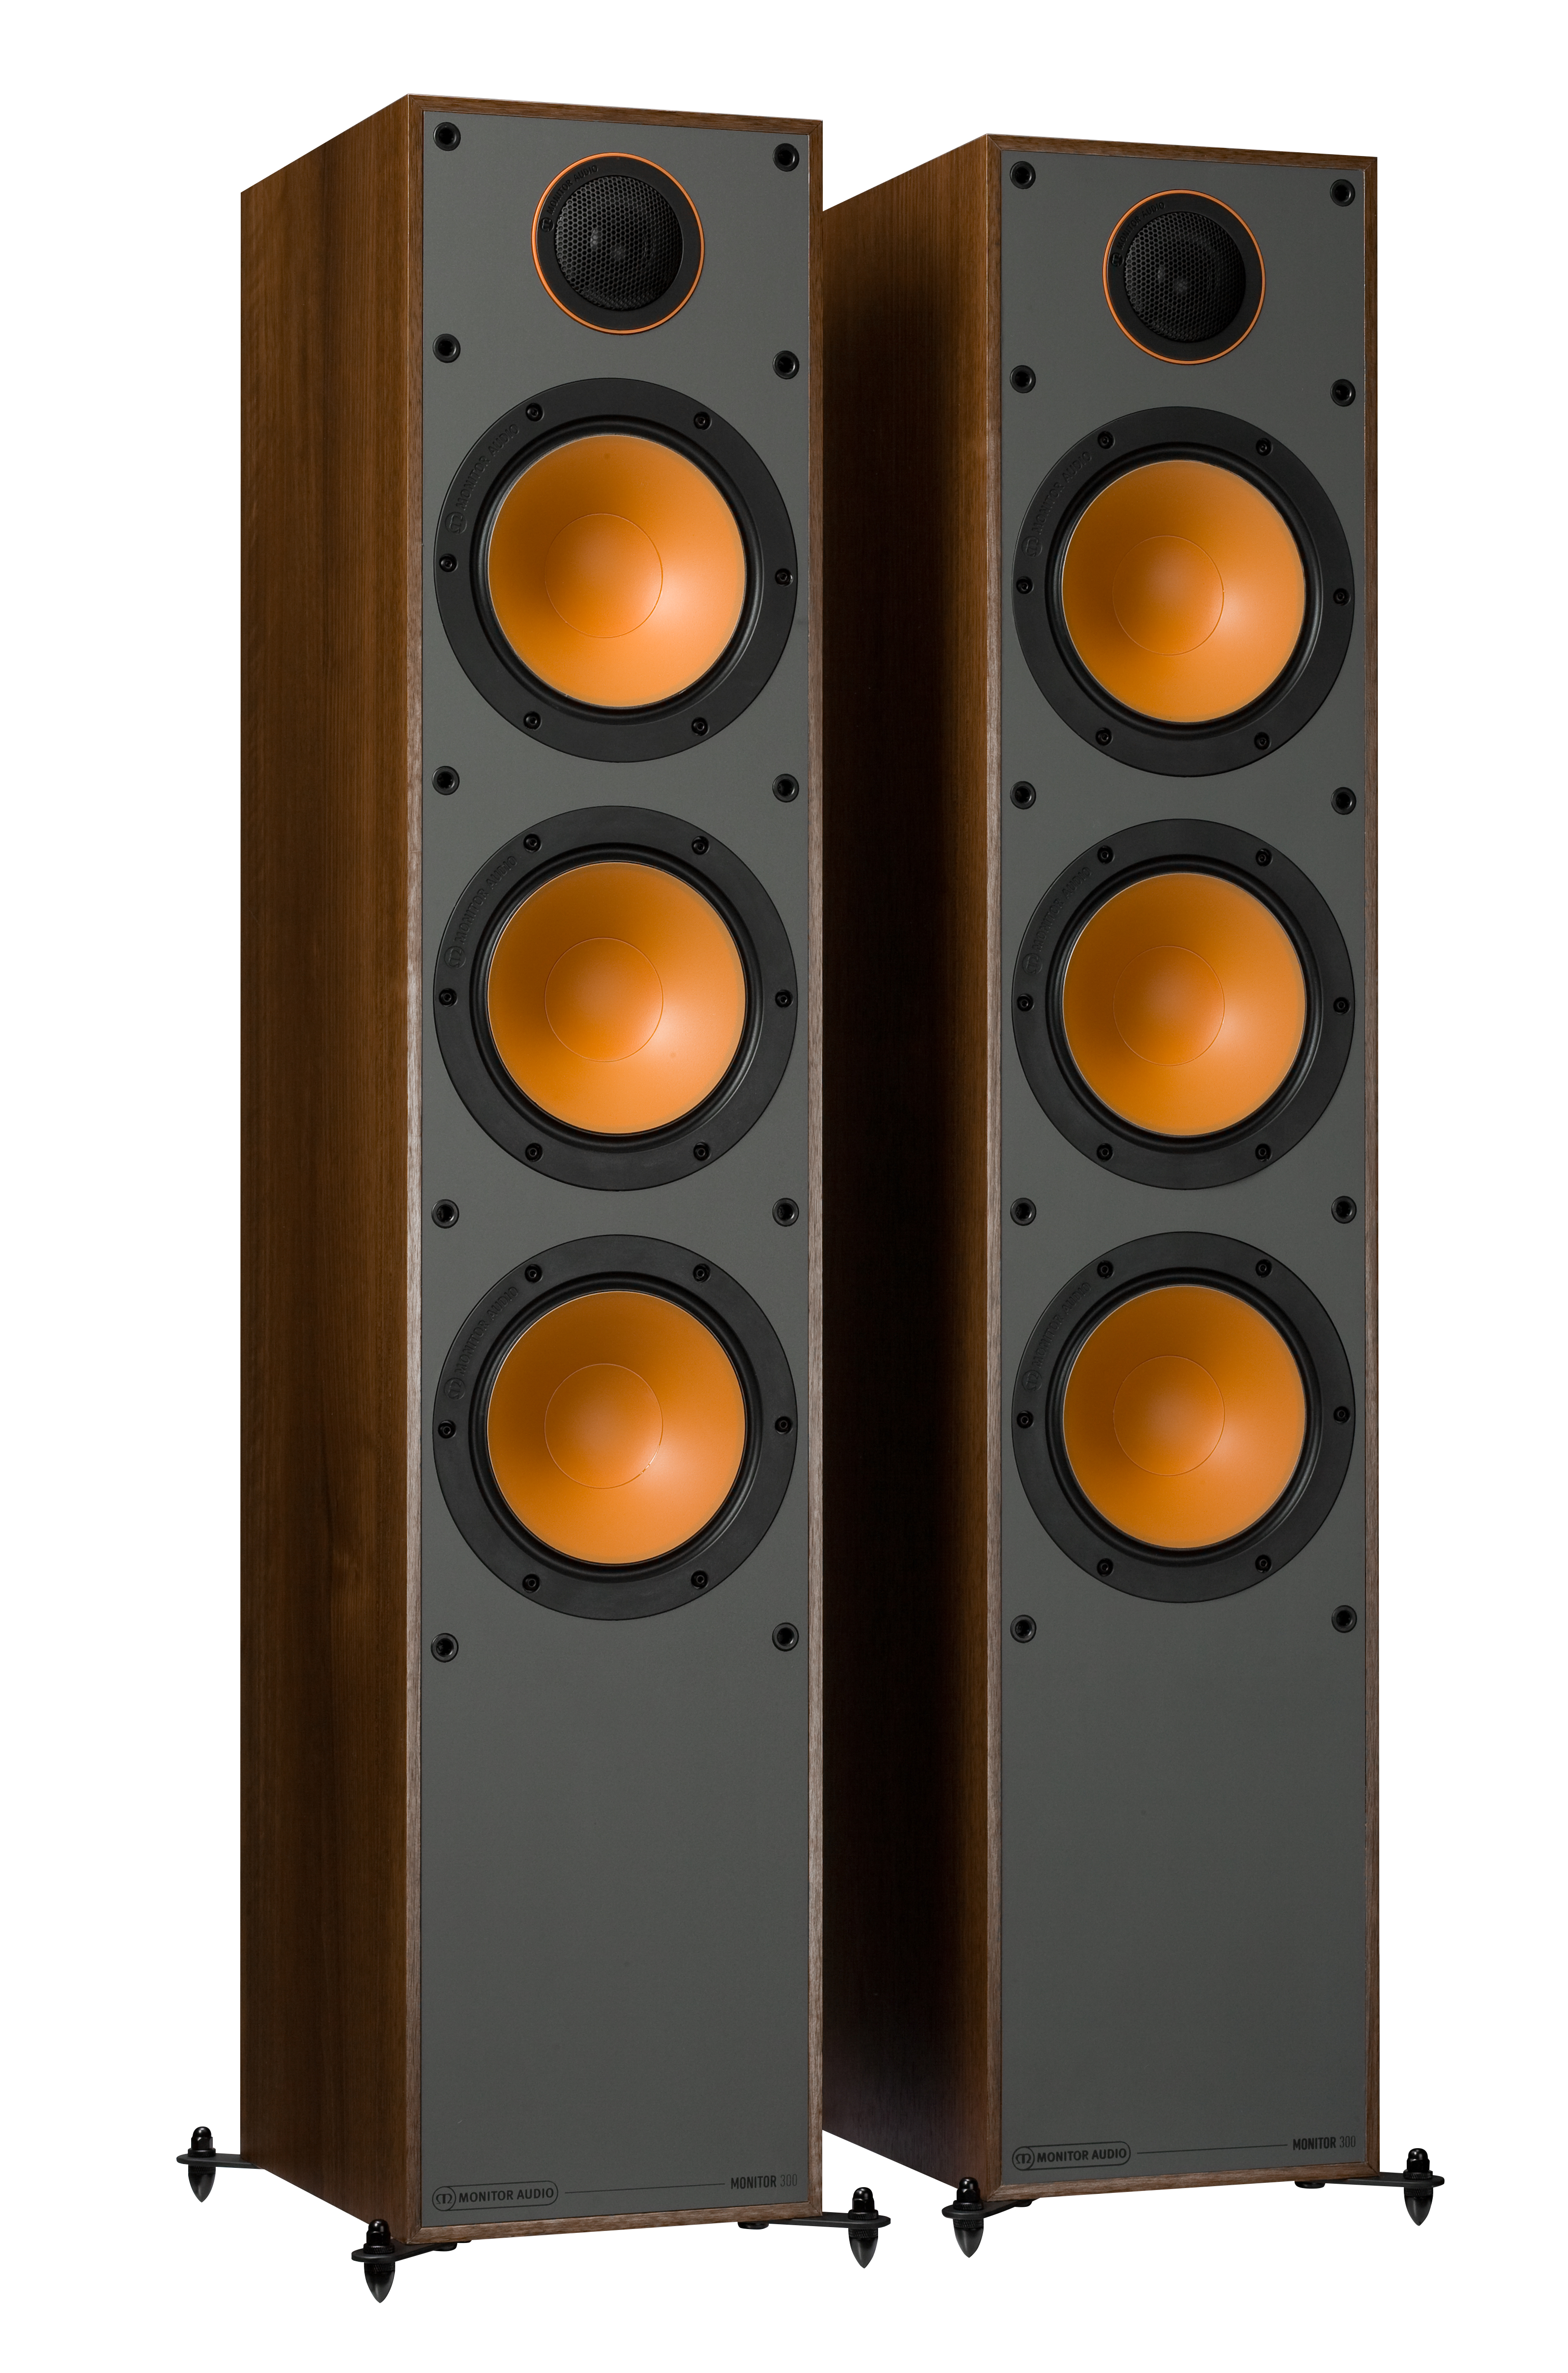 Loa Monitor 300, cặp loa sáng giá của Monitor Audio